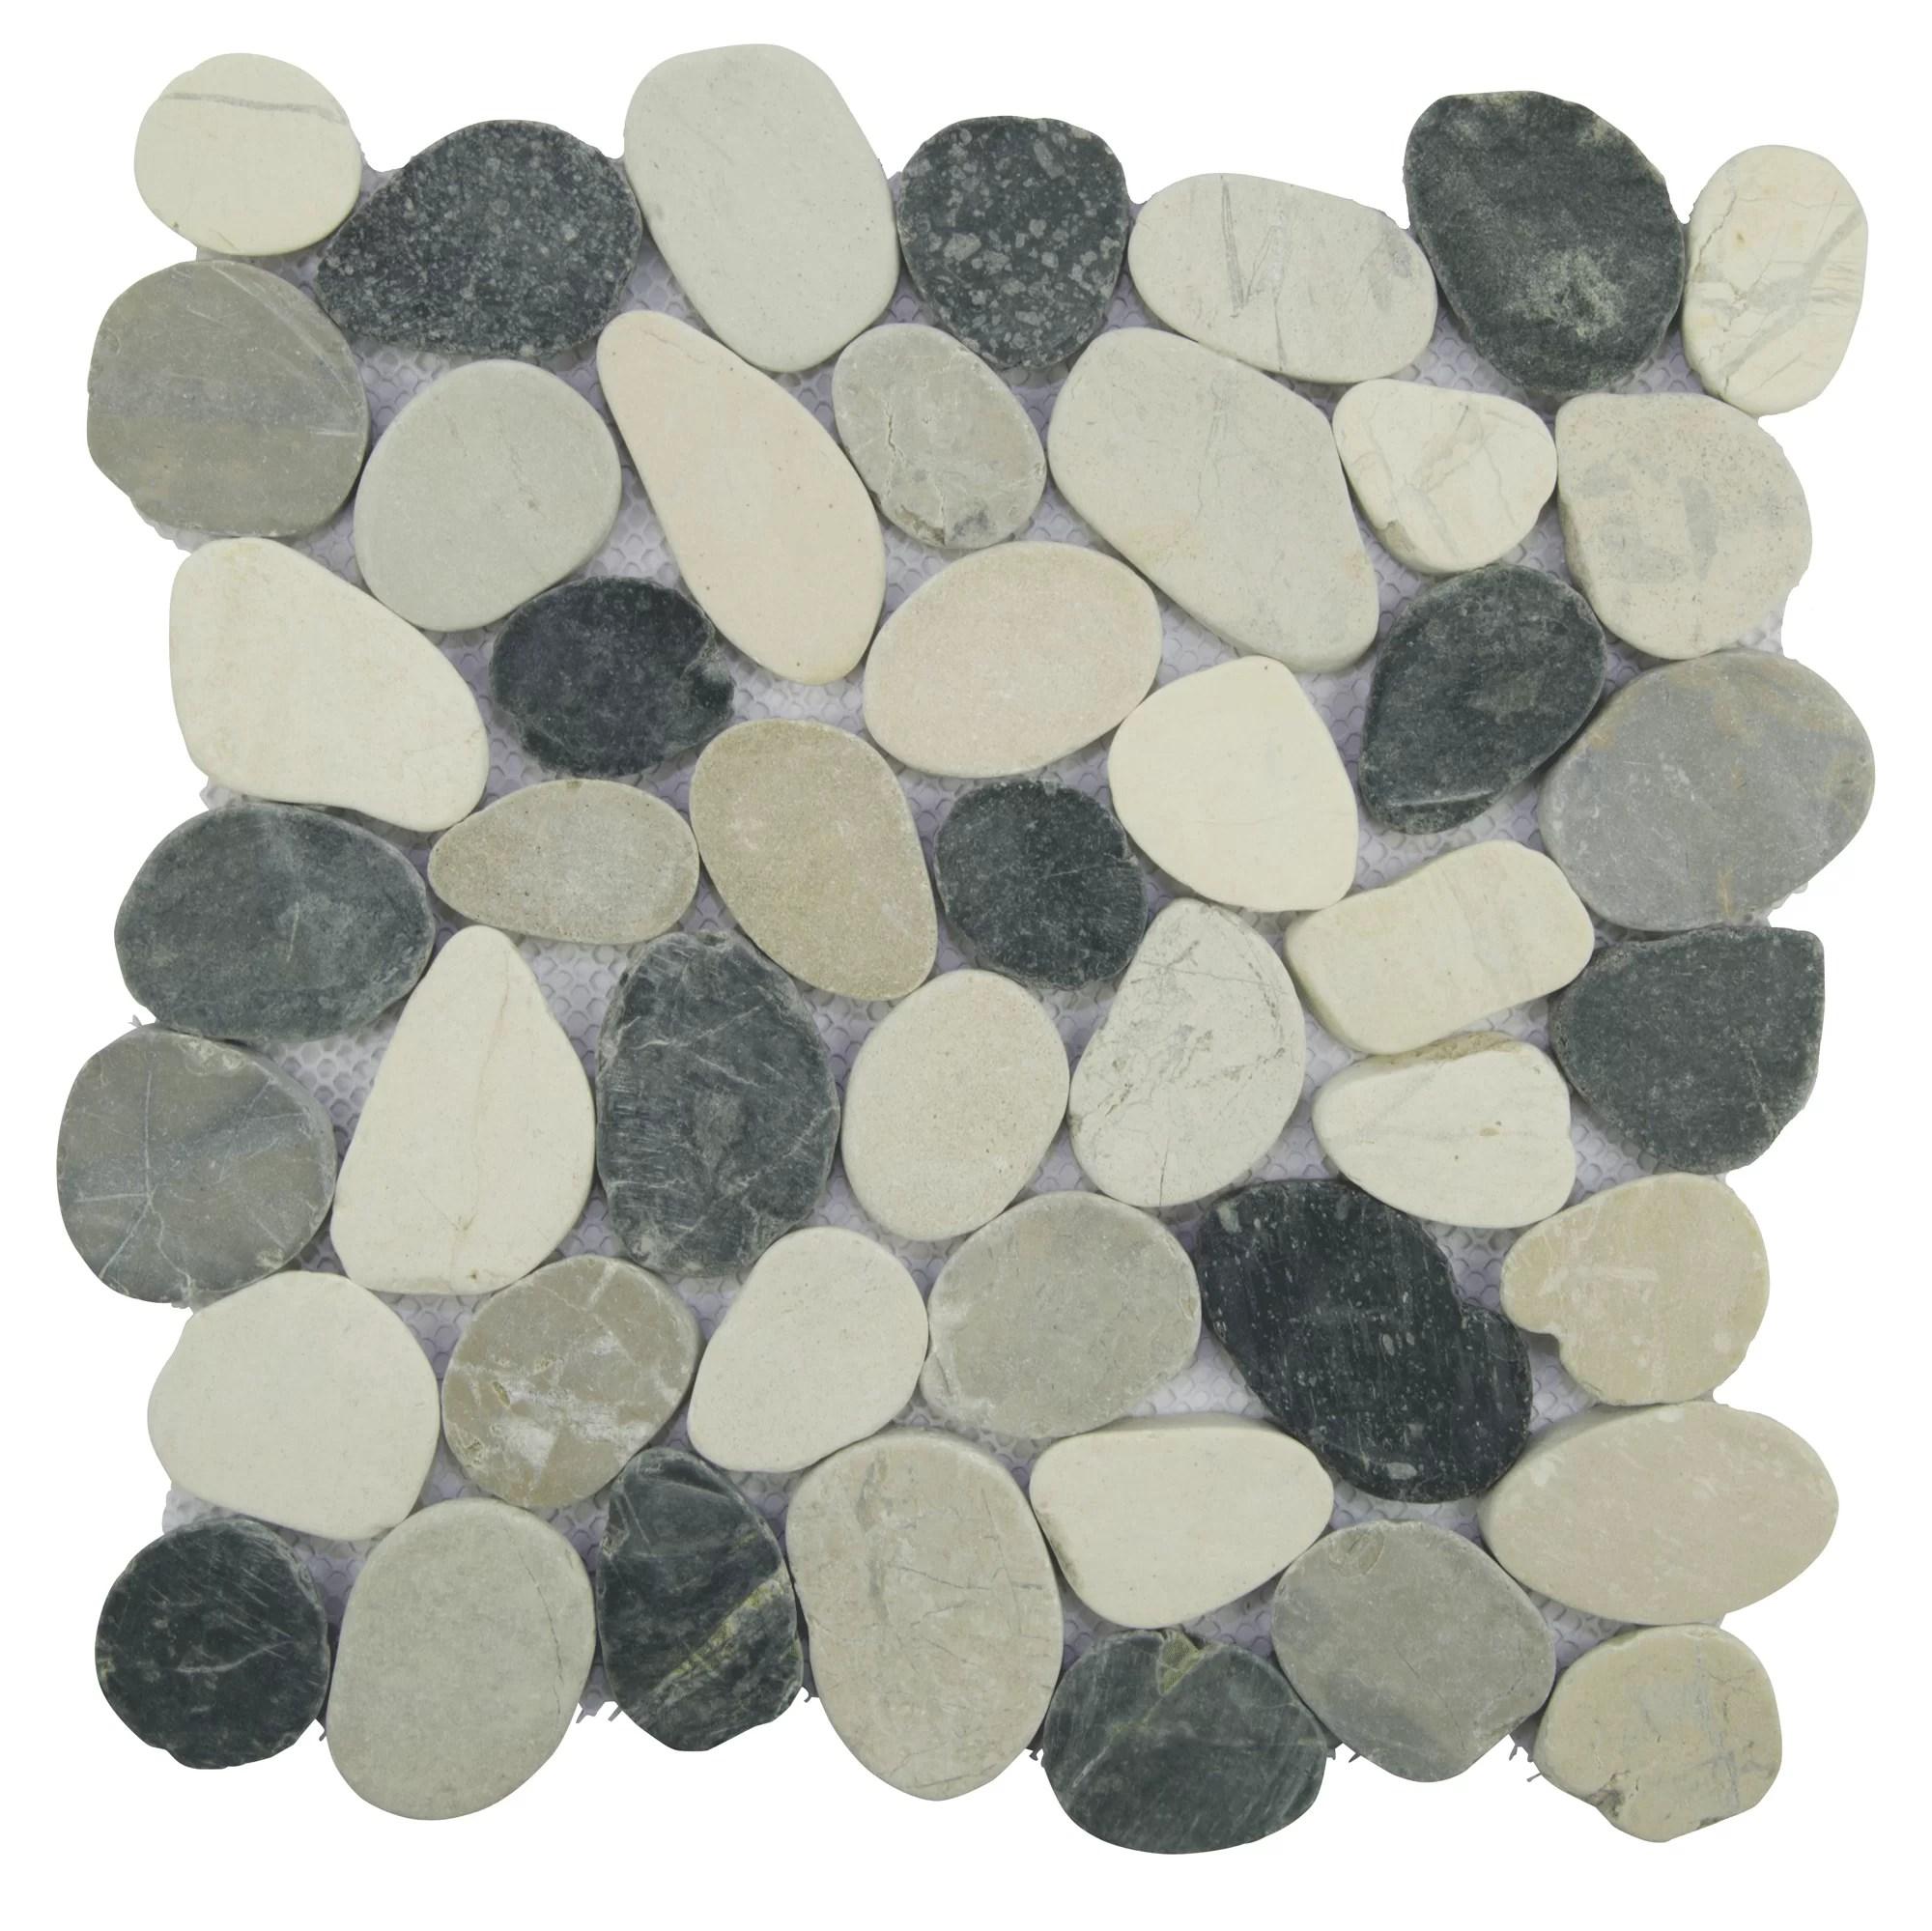 diy materials tan natural round pebble